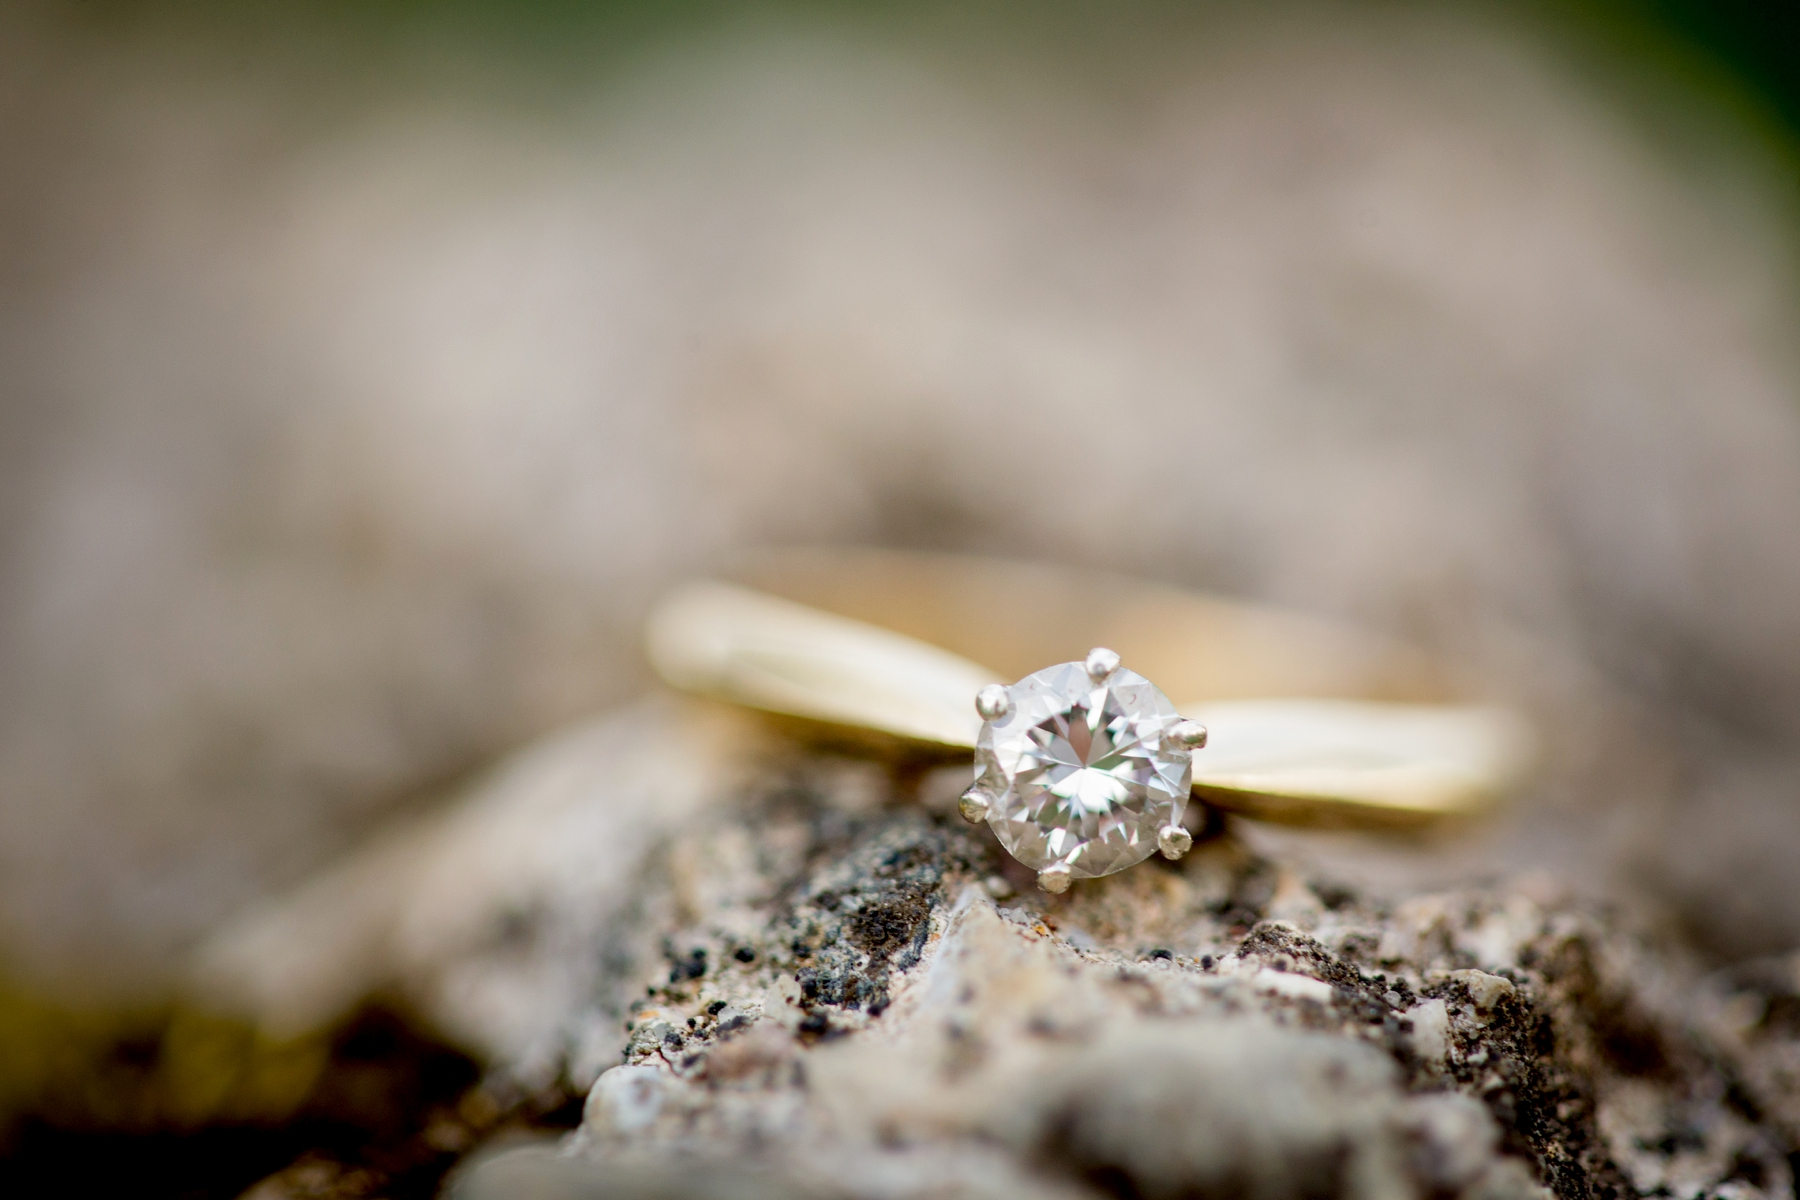 Brandon_Shafer_Photography_Shane_Ashley_Greenhouse_Farm_Michigan_Engagement_0030.jpg